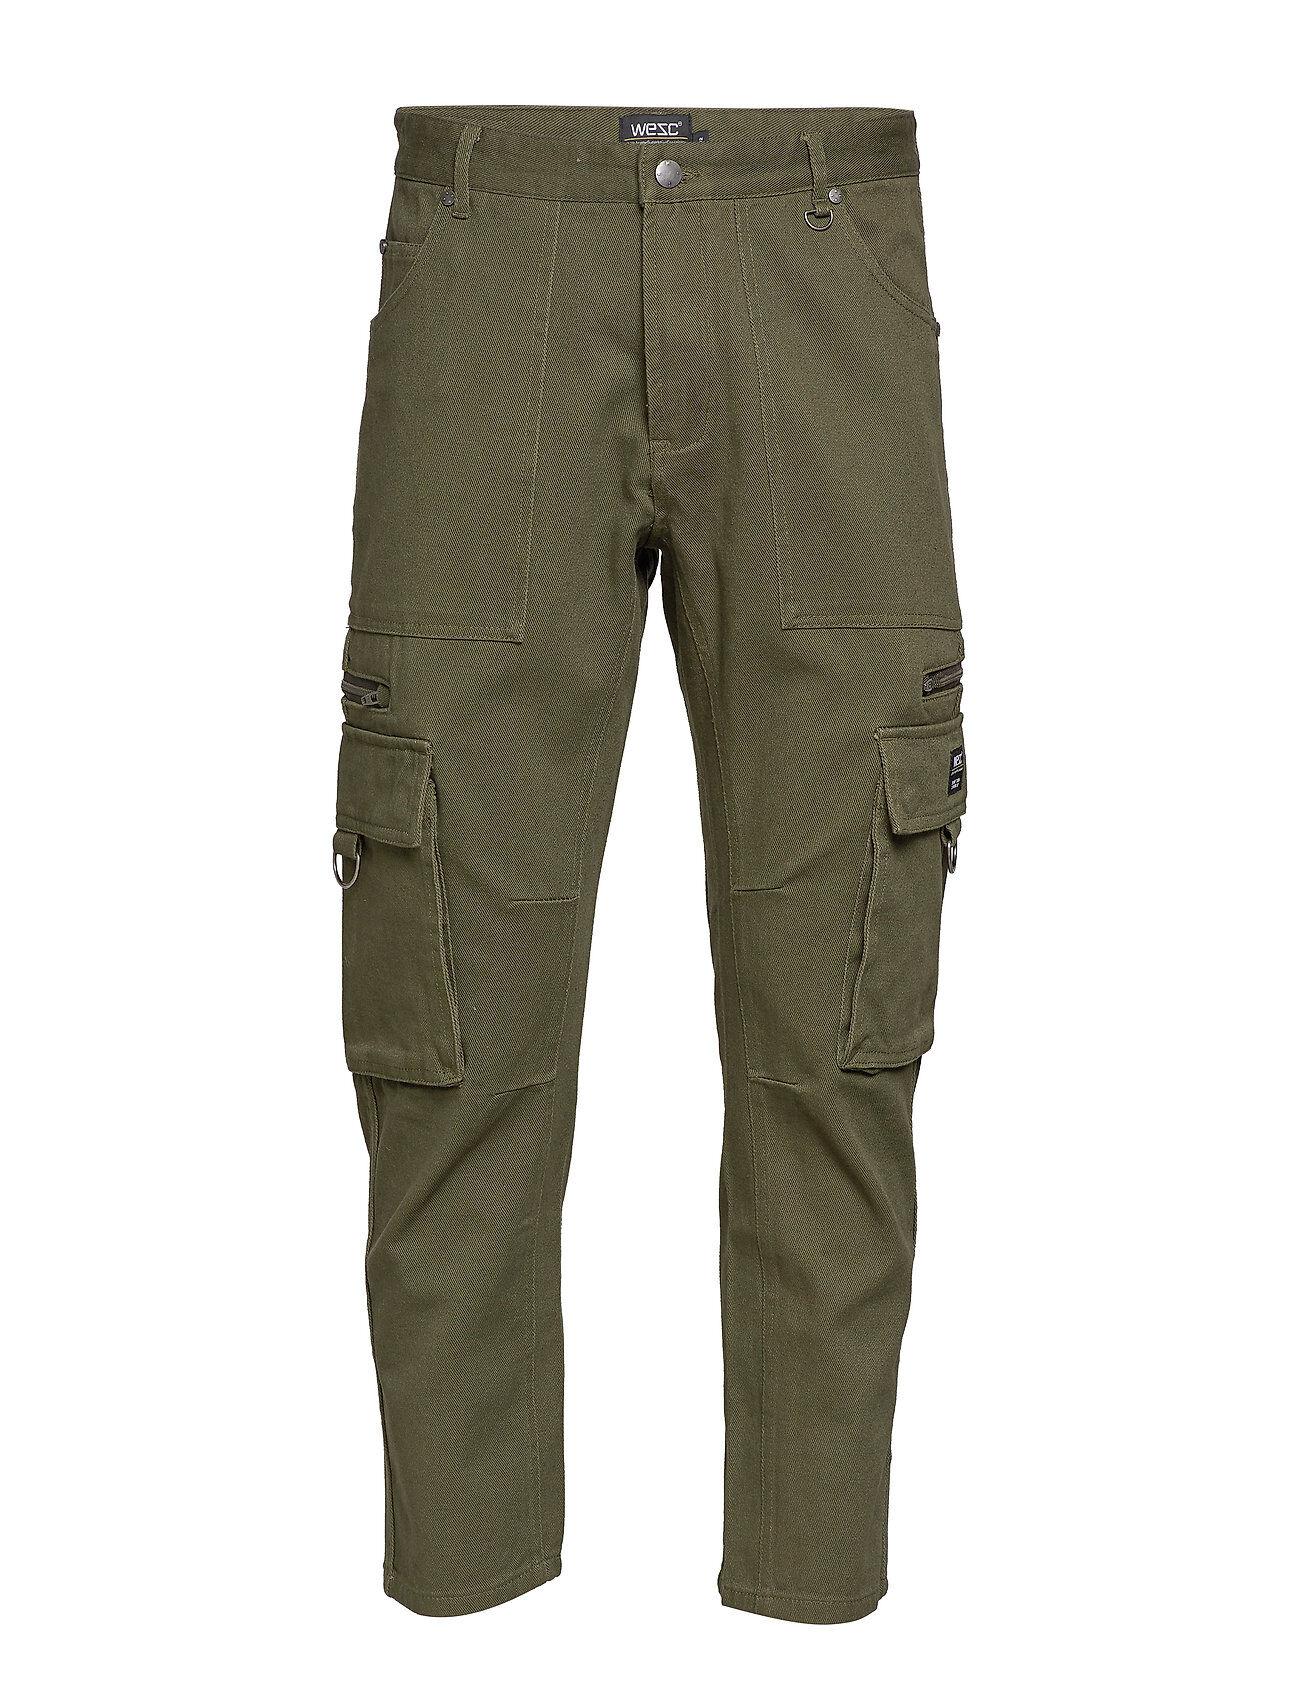 WeSC Tapered Utility Pant Trousers Cargo Pants Vihreä WeSC